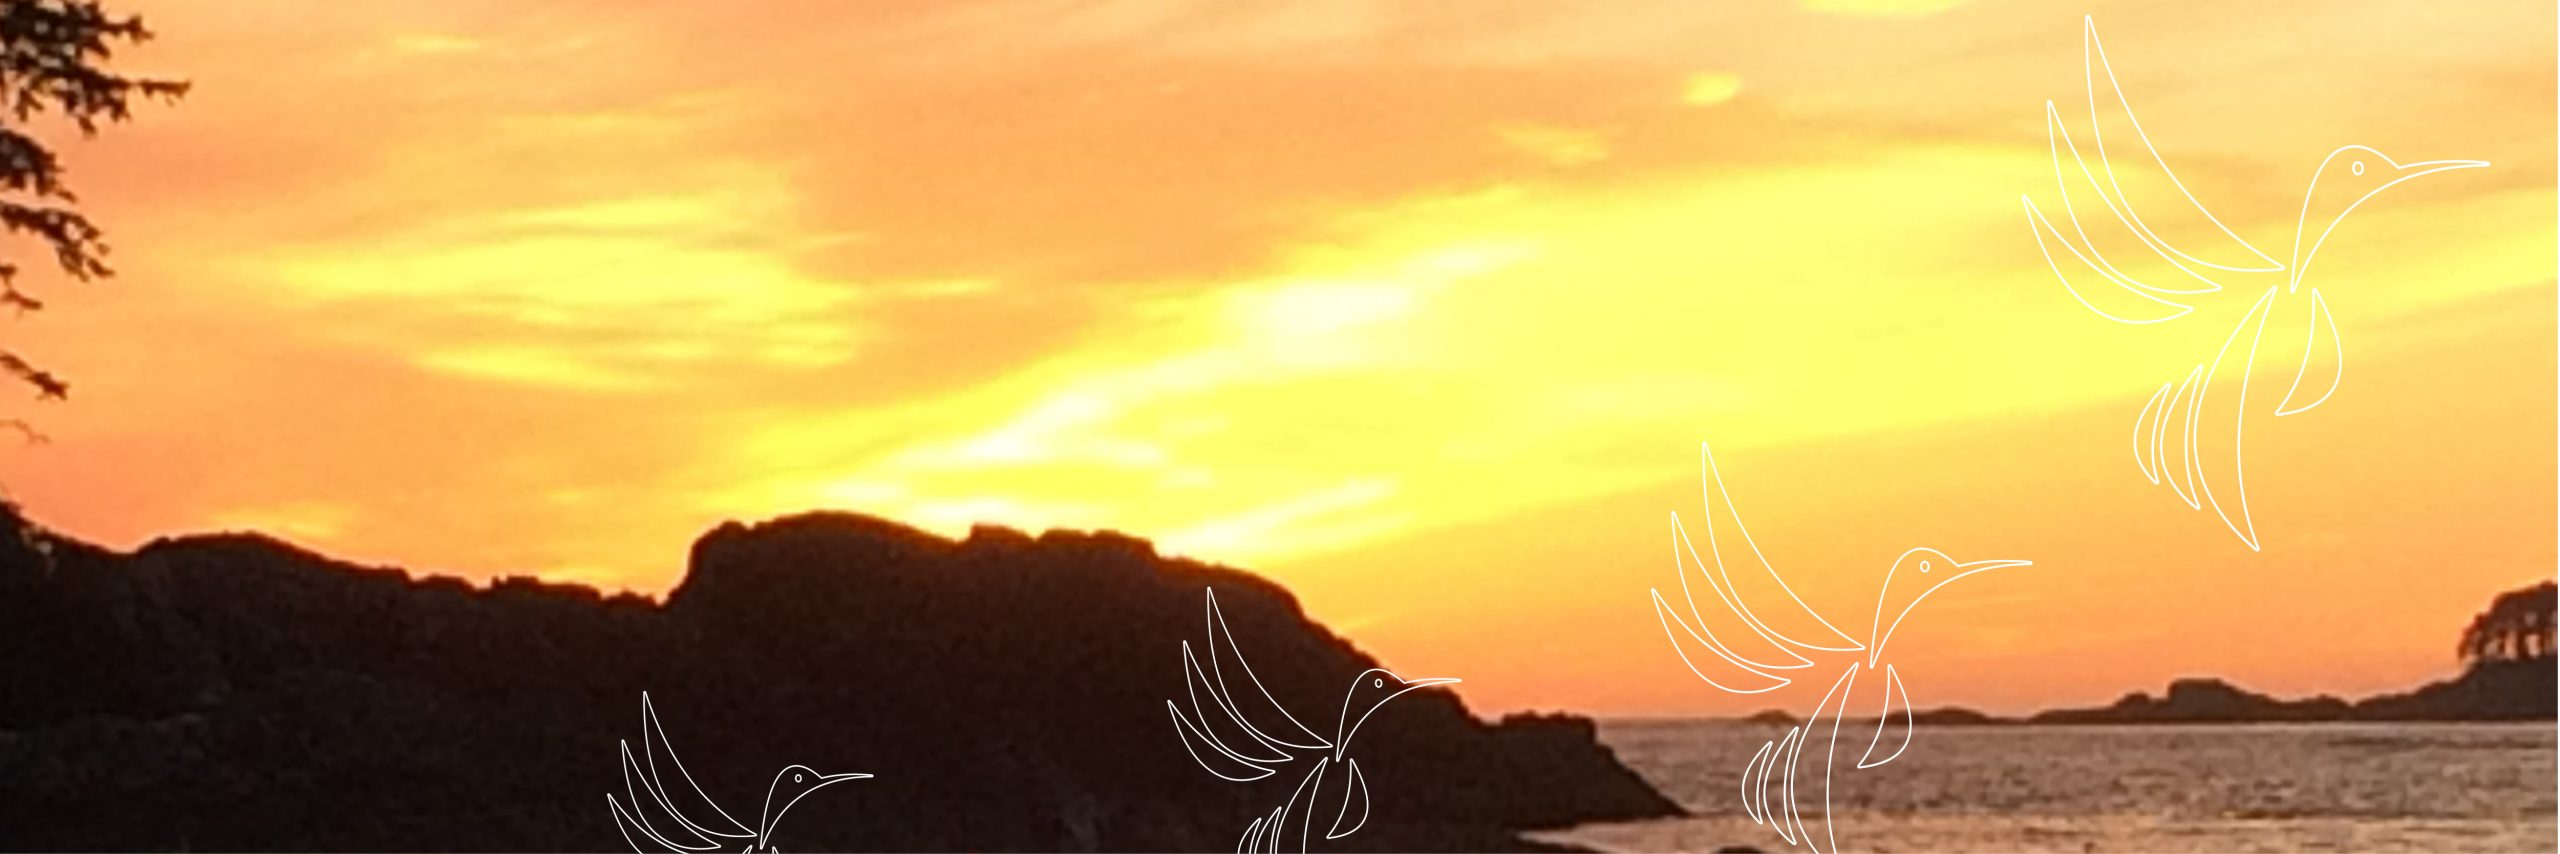 Birds taking flight - sunset sky over water